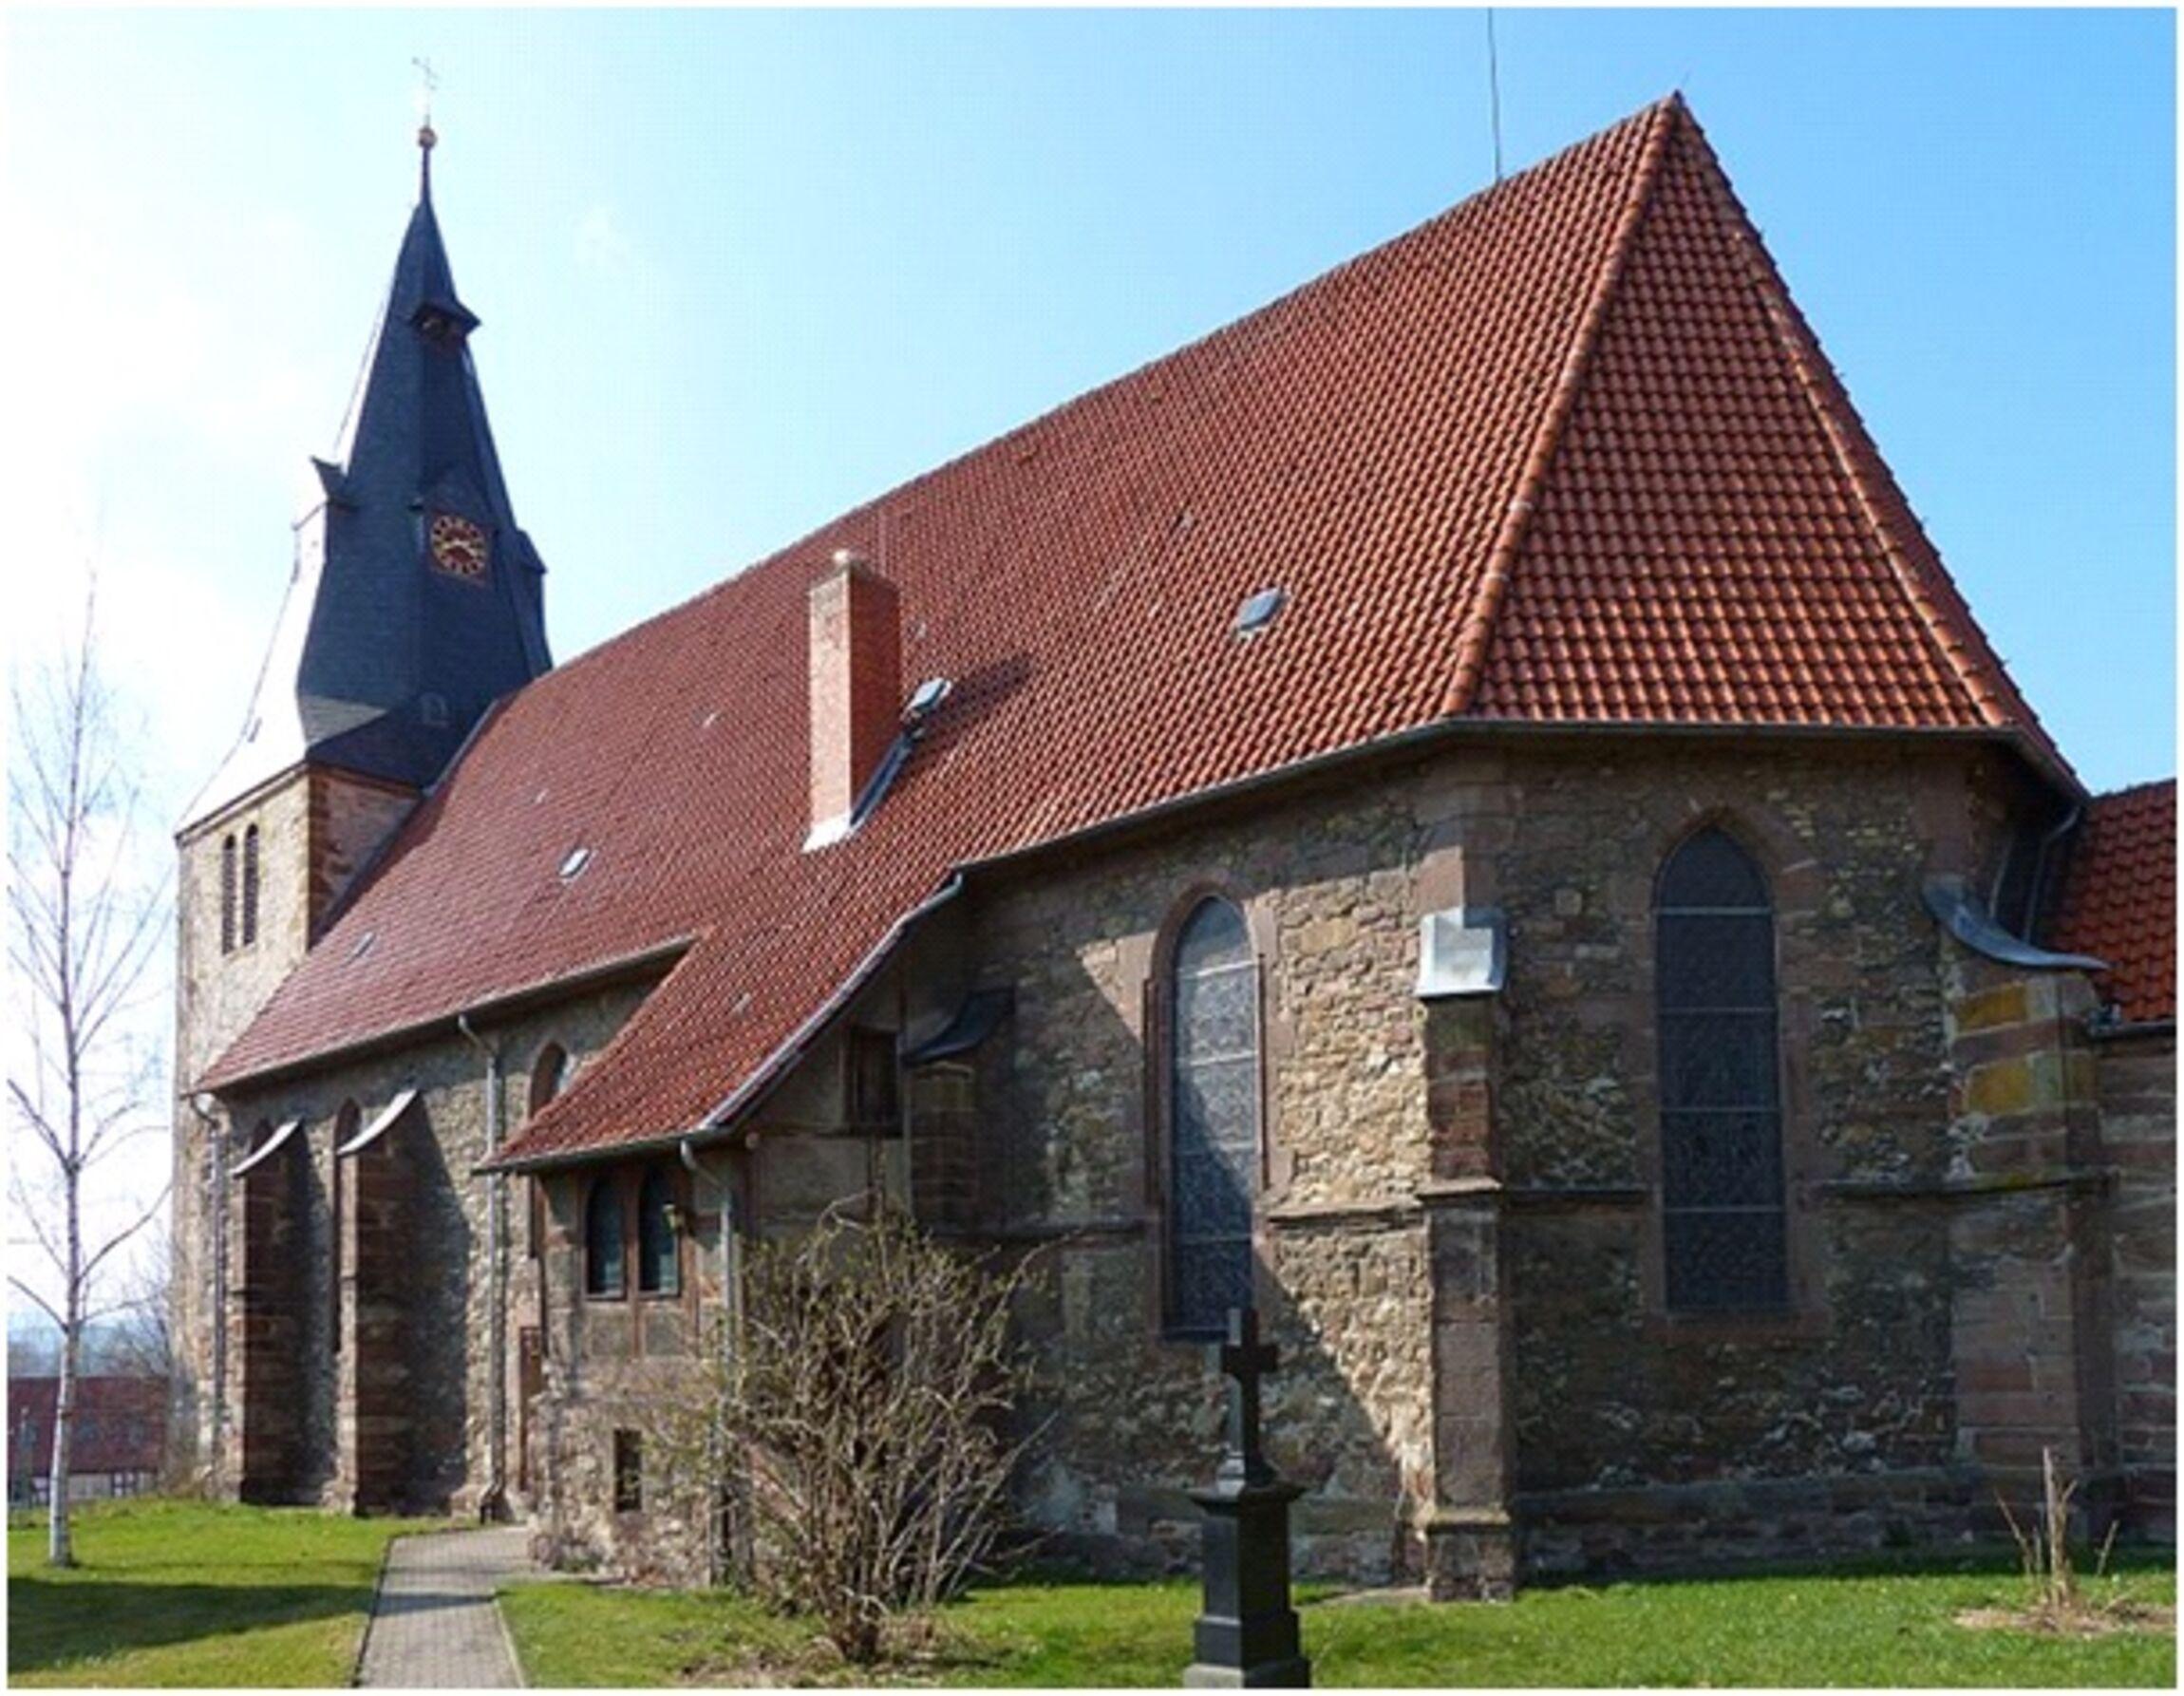 St.-Martini-Kirche-Hohnstedt